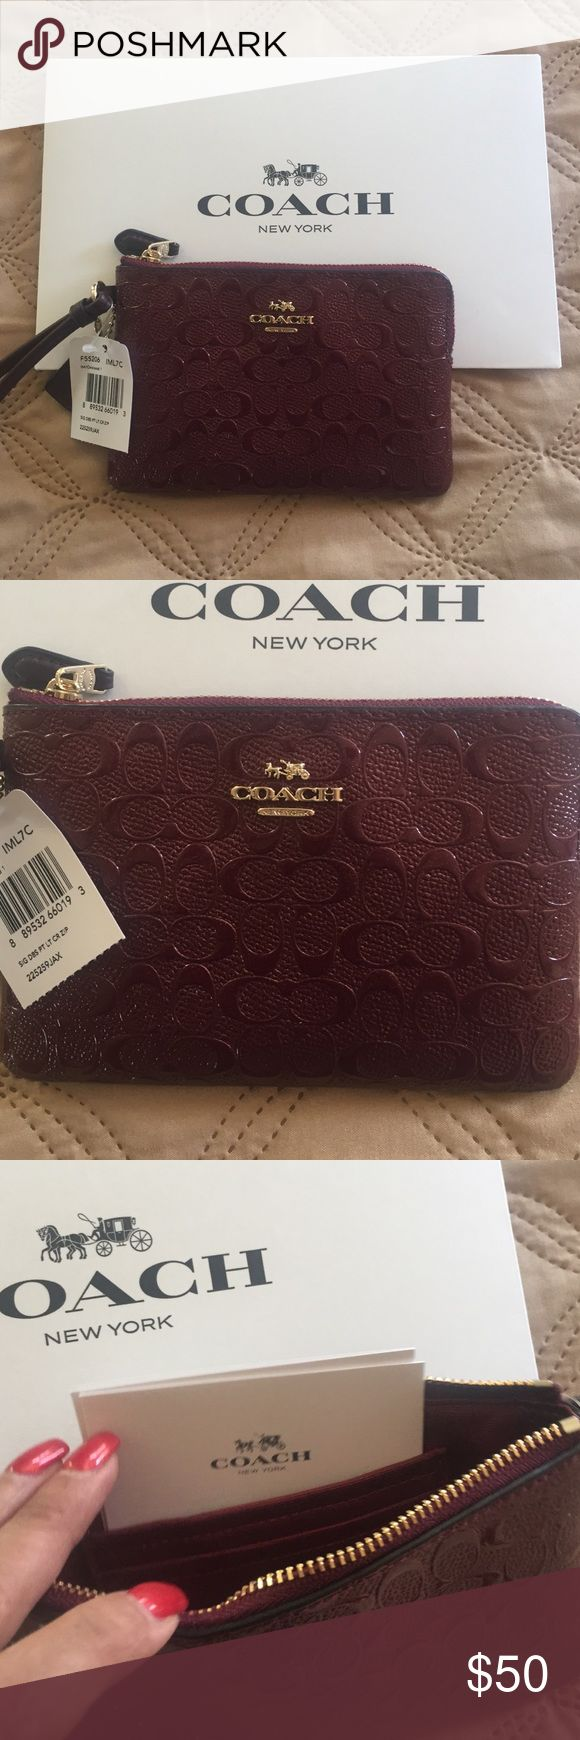 A beautiful Coach wristlet A brand new Coach wristlet, beautiful merlot color Coach Bags Clutches & Wristlets